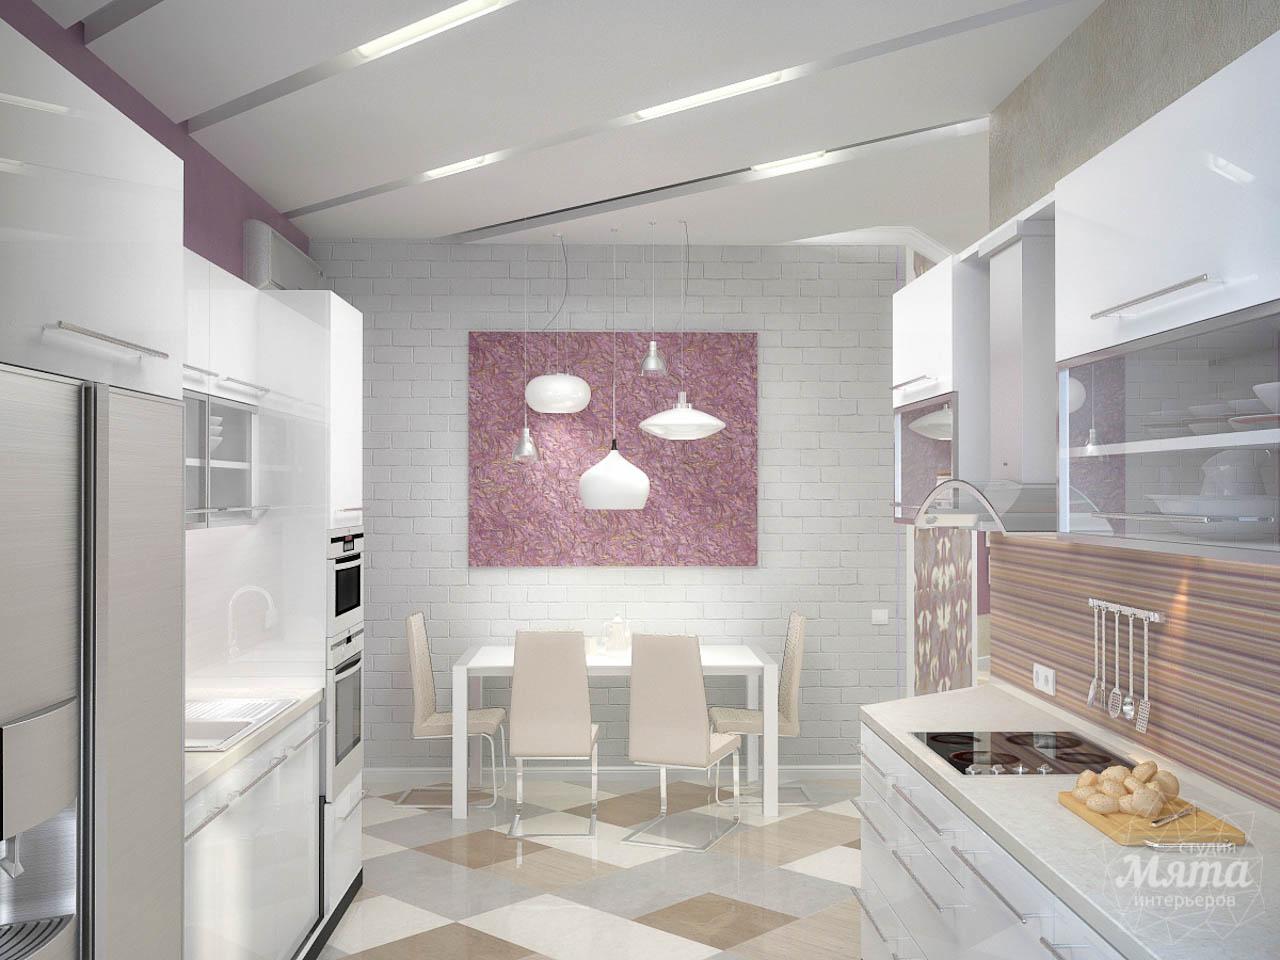 Дизайн интерьера и ремонт трехкомнатной квартиры по ул. Чкалова 124 img779684519